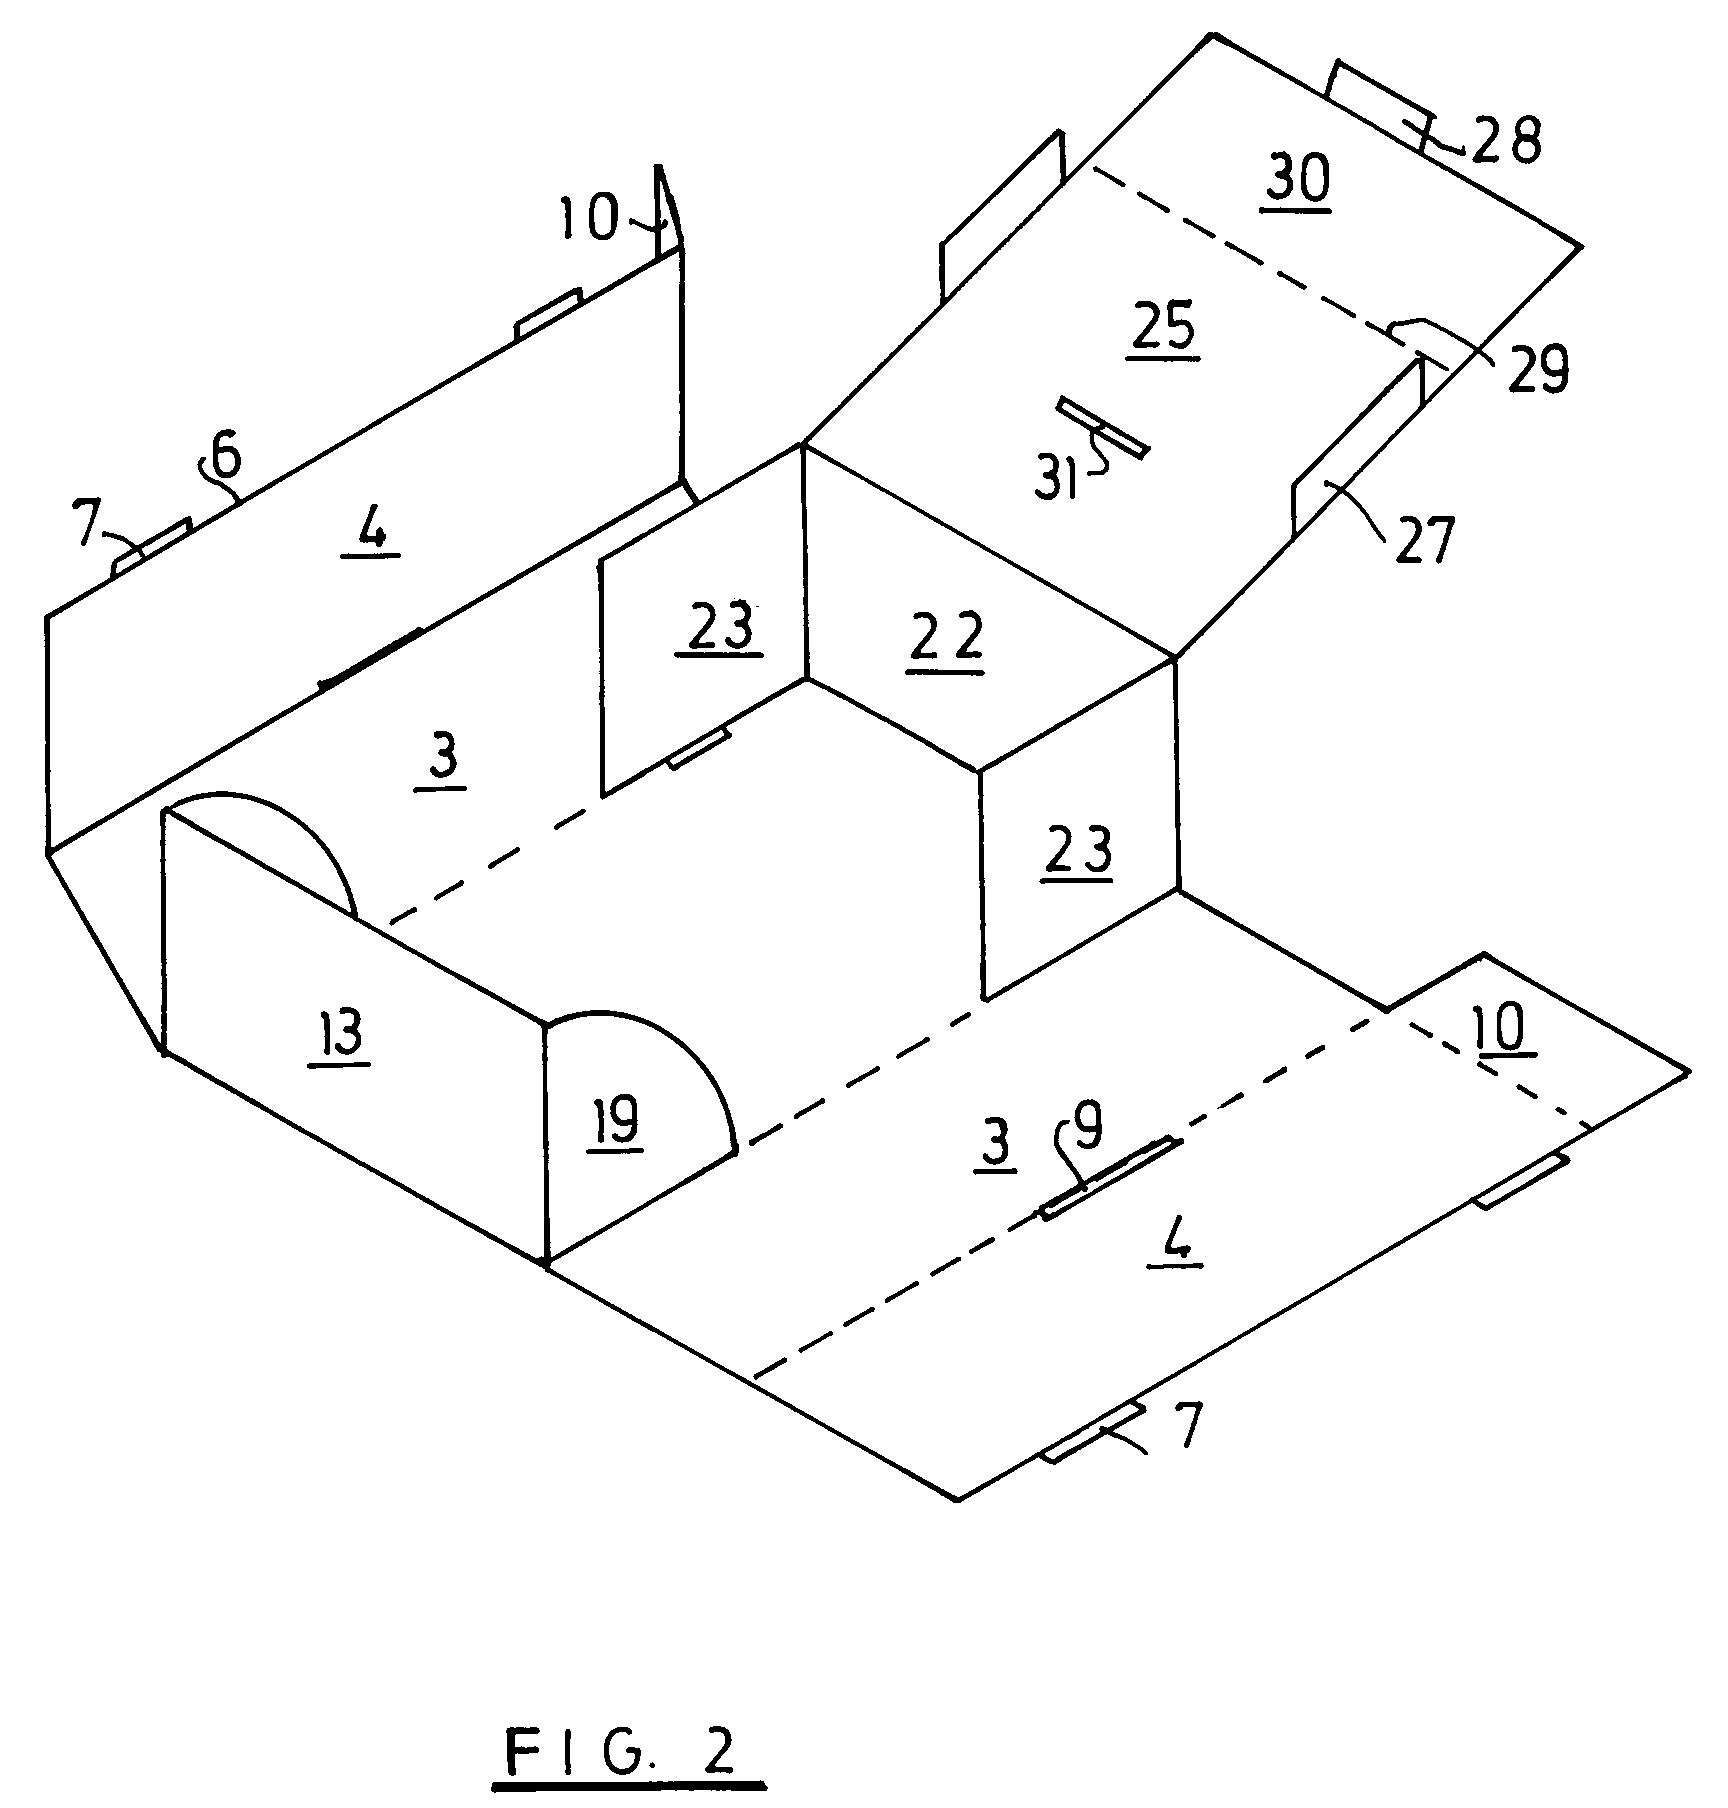 patent ep0947431a2 faltschachtel google patents. Black Bedroom Furniture Sets. Home Design Ideas